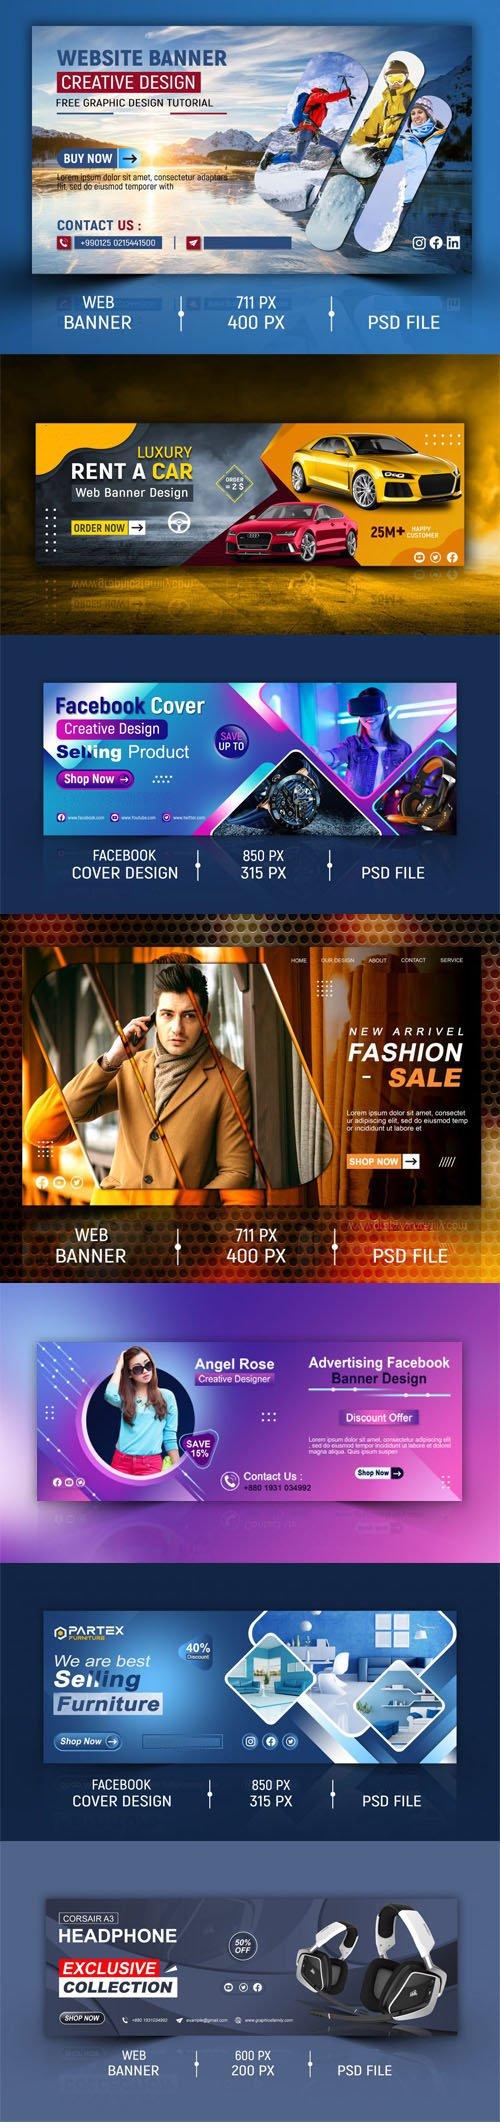 7 Web Banner & Facebook Cover Design Templates in PSD